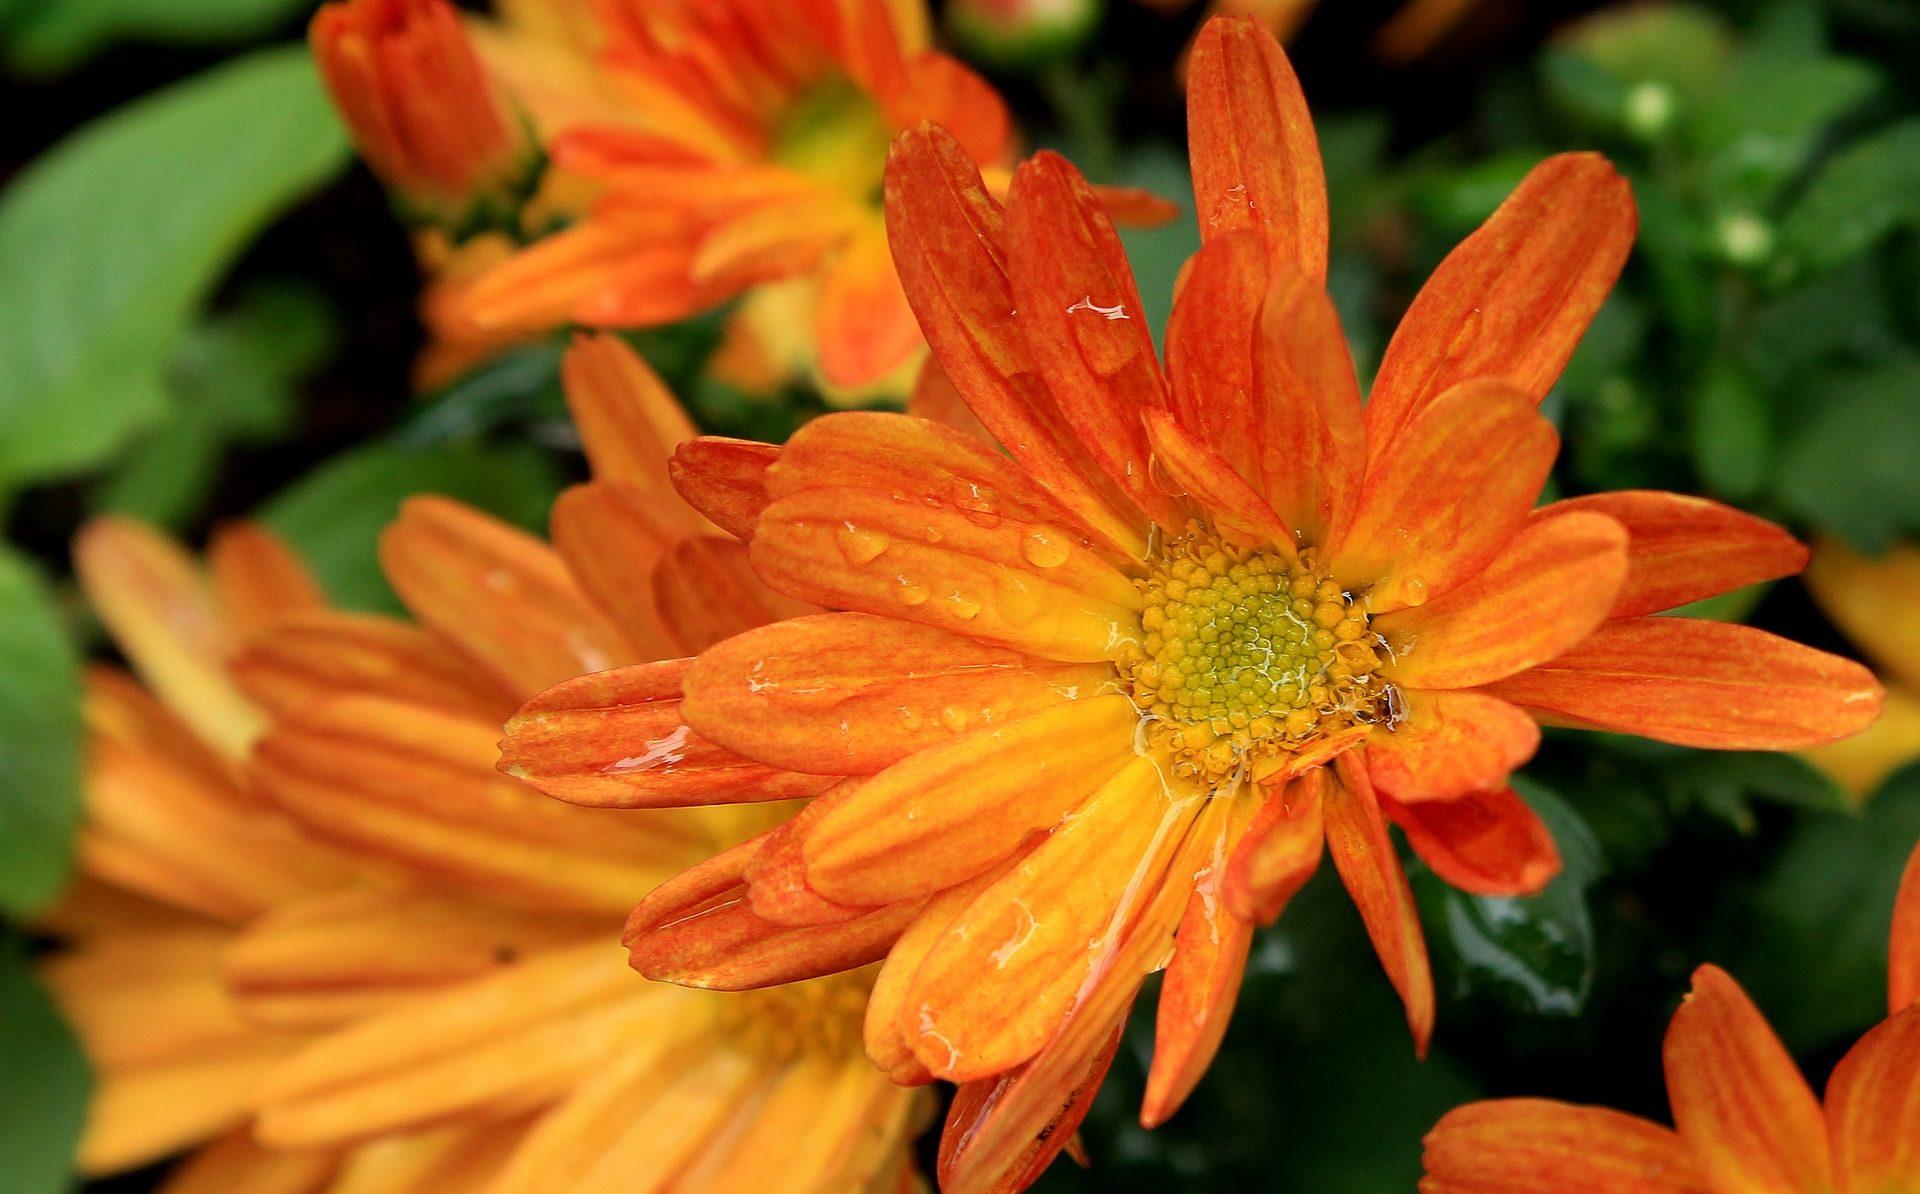 Margarita, Orange, fiore, petali di, Jardín, gocce, pioggia - Sfondi HD - Professor-falken.com